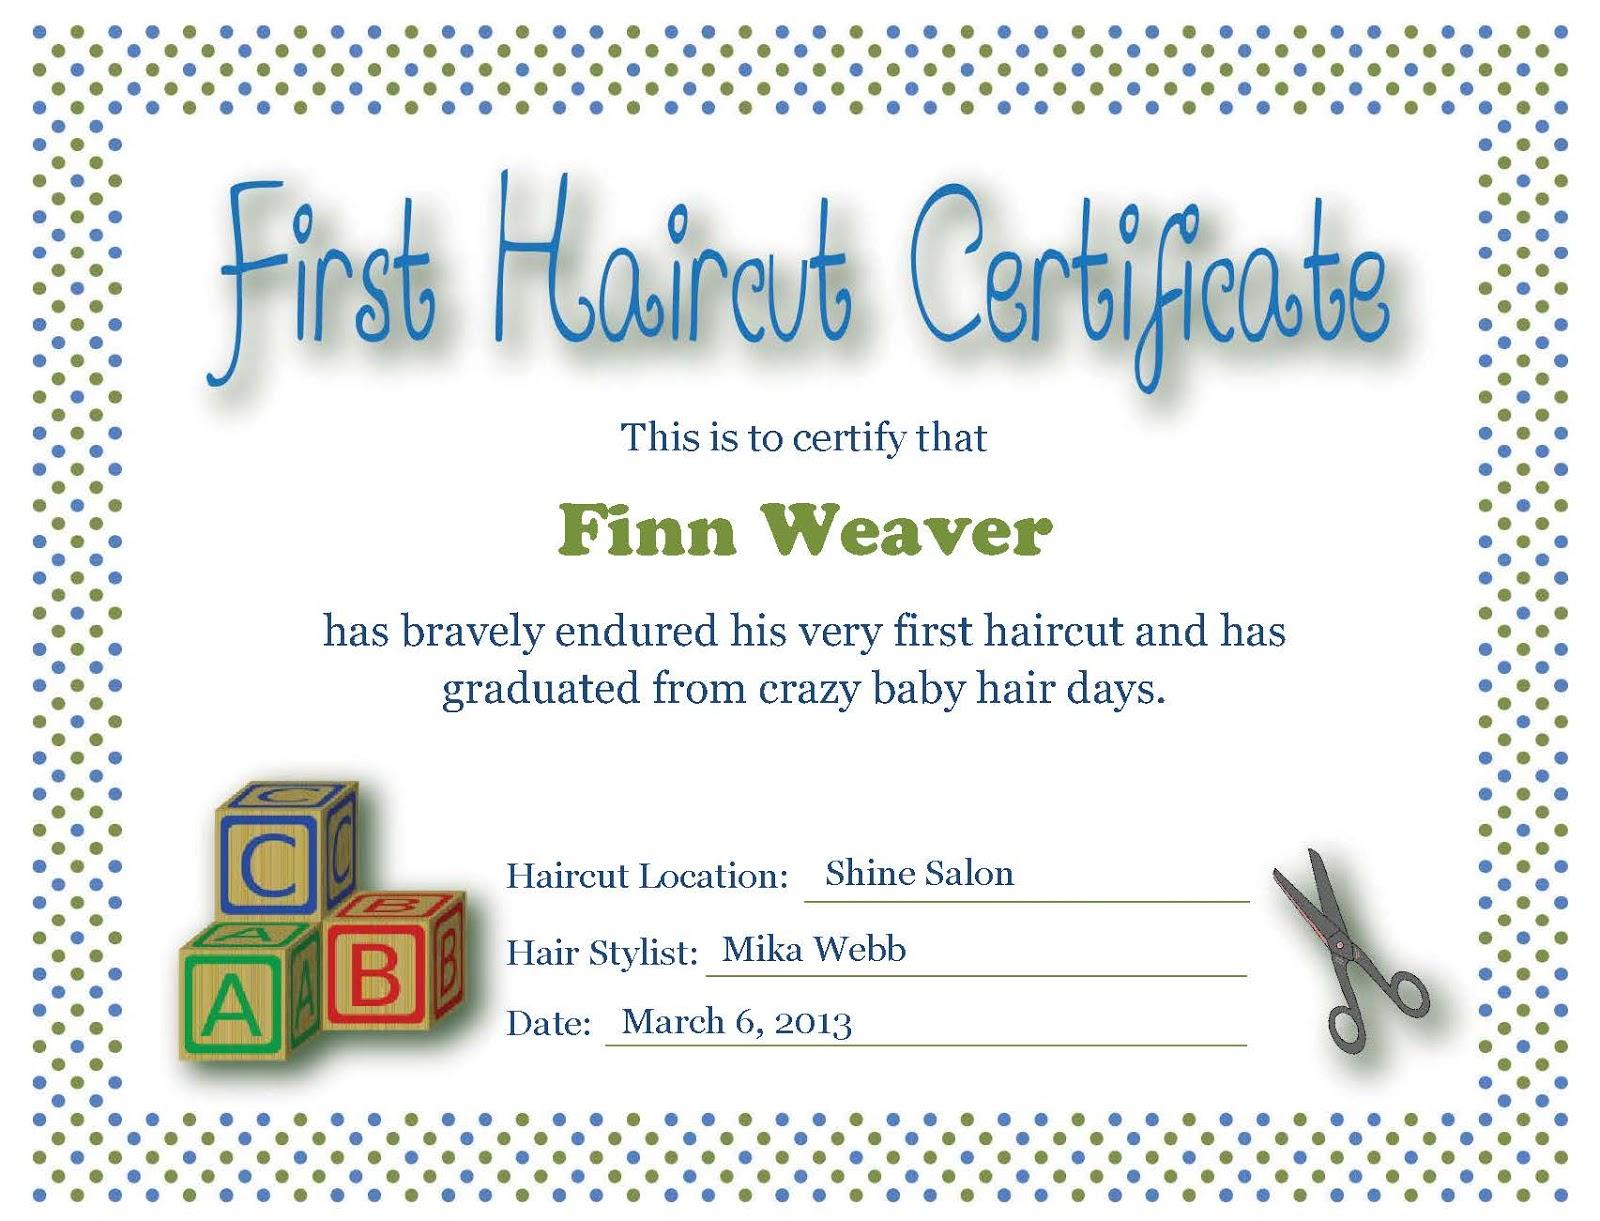 six dream weavers  finn firsts  haircut  and steps